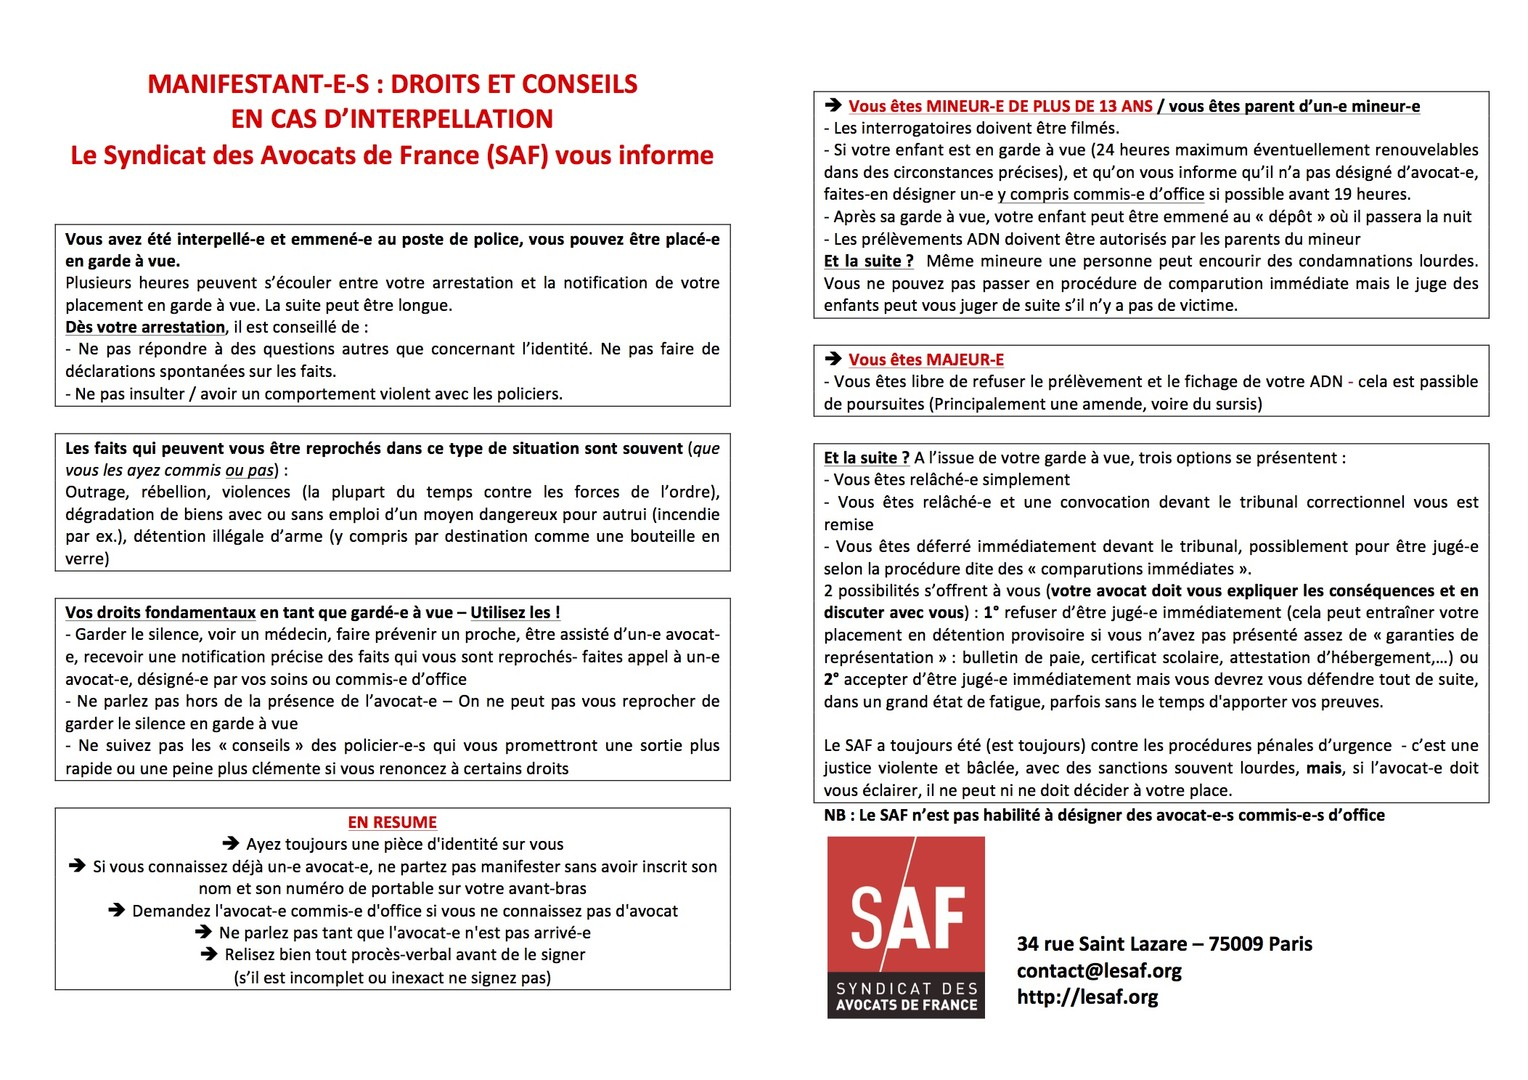 Tract du Syndicat des avocats de France